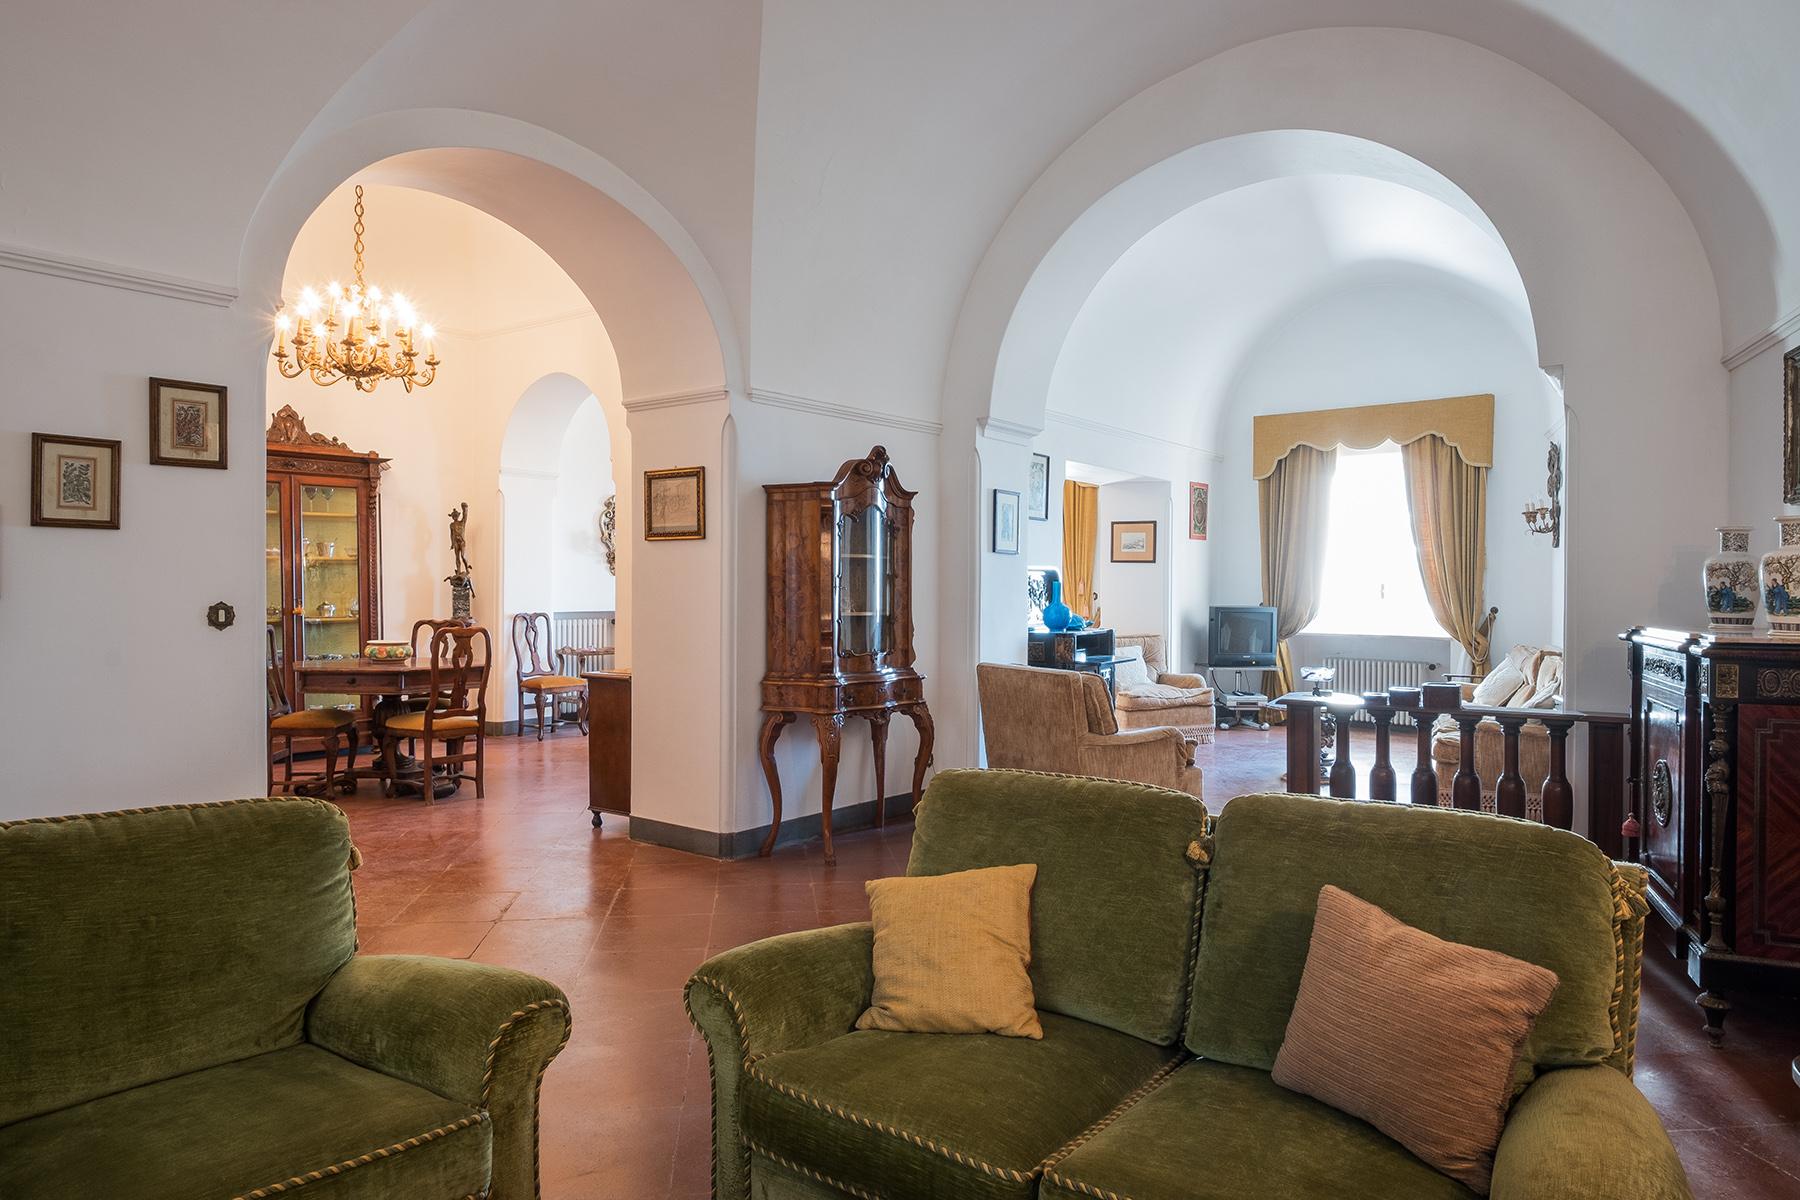 Casa indipendente in Vendita a Capri: 5 locali, 400 mq - Foto 8